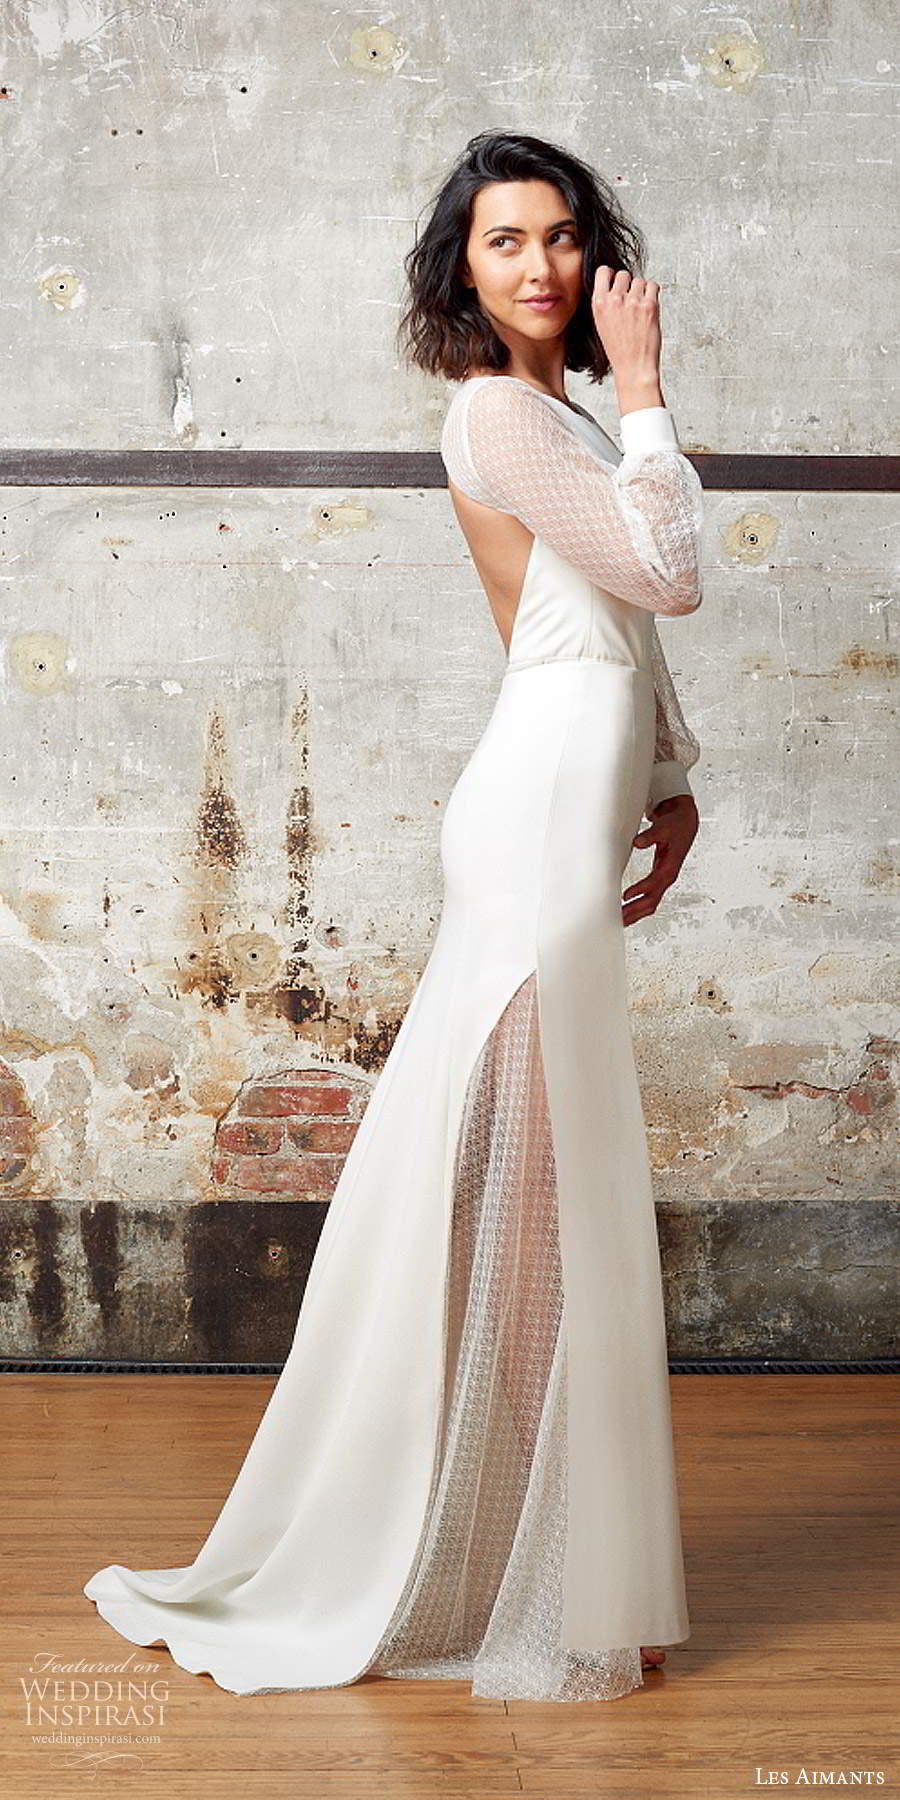 les aimants 2019 bridal illusion bishop sleeves jewel neckline clean minimally embellished sheath trumpet wedding dress cutout back chapel train (5) sv